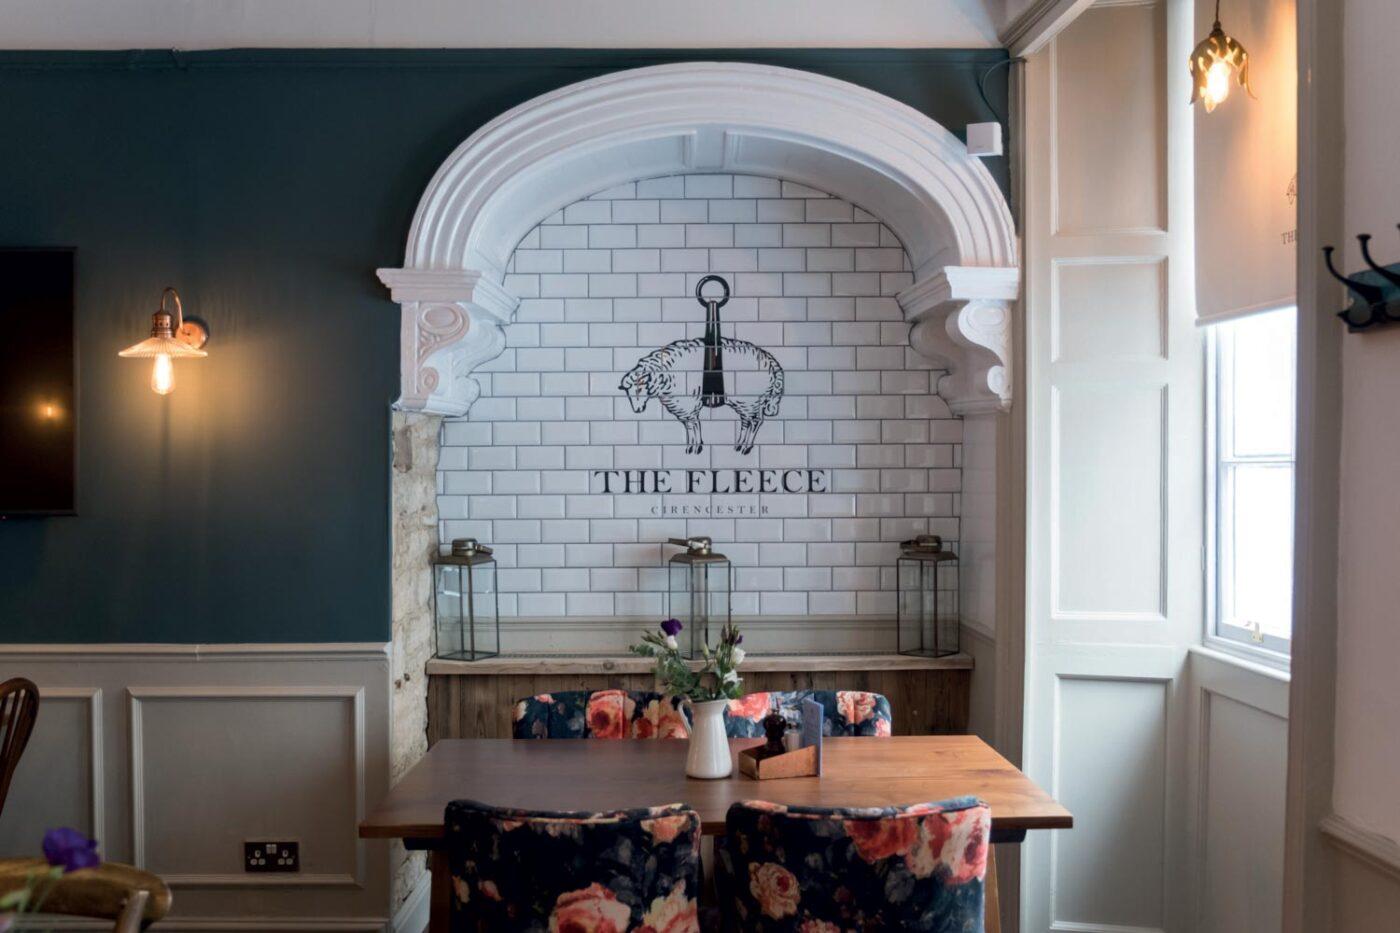 The Fleece Cirencester Wall Light